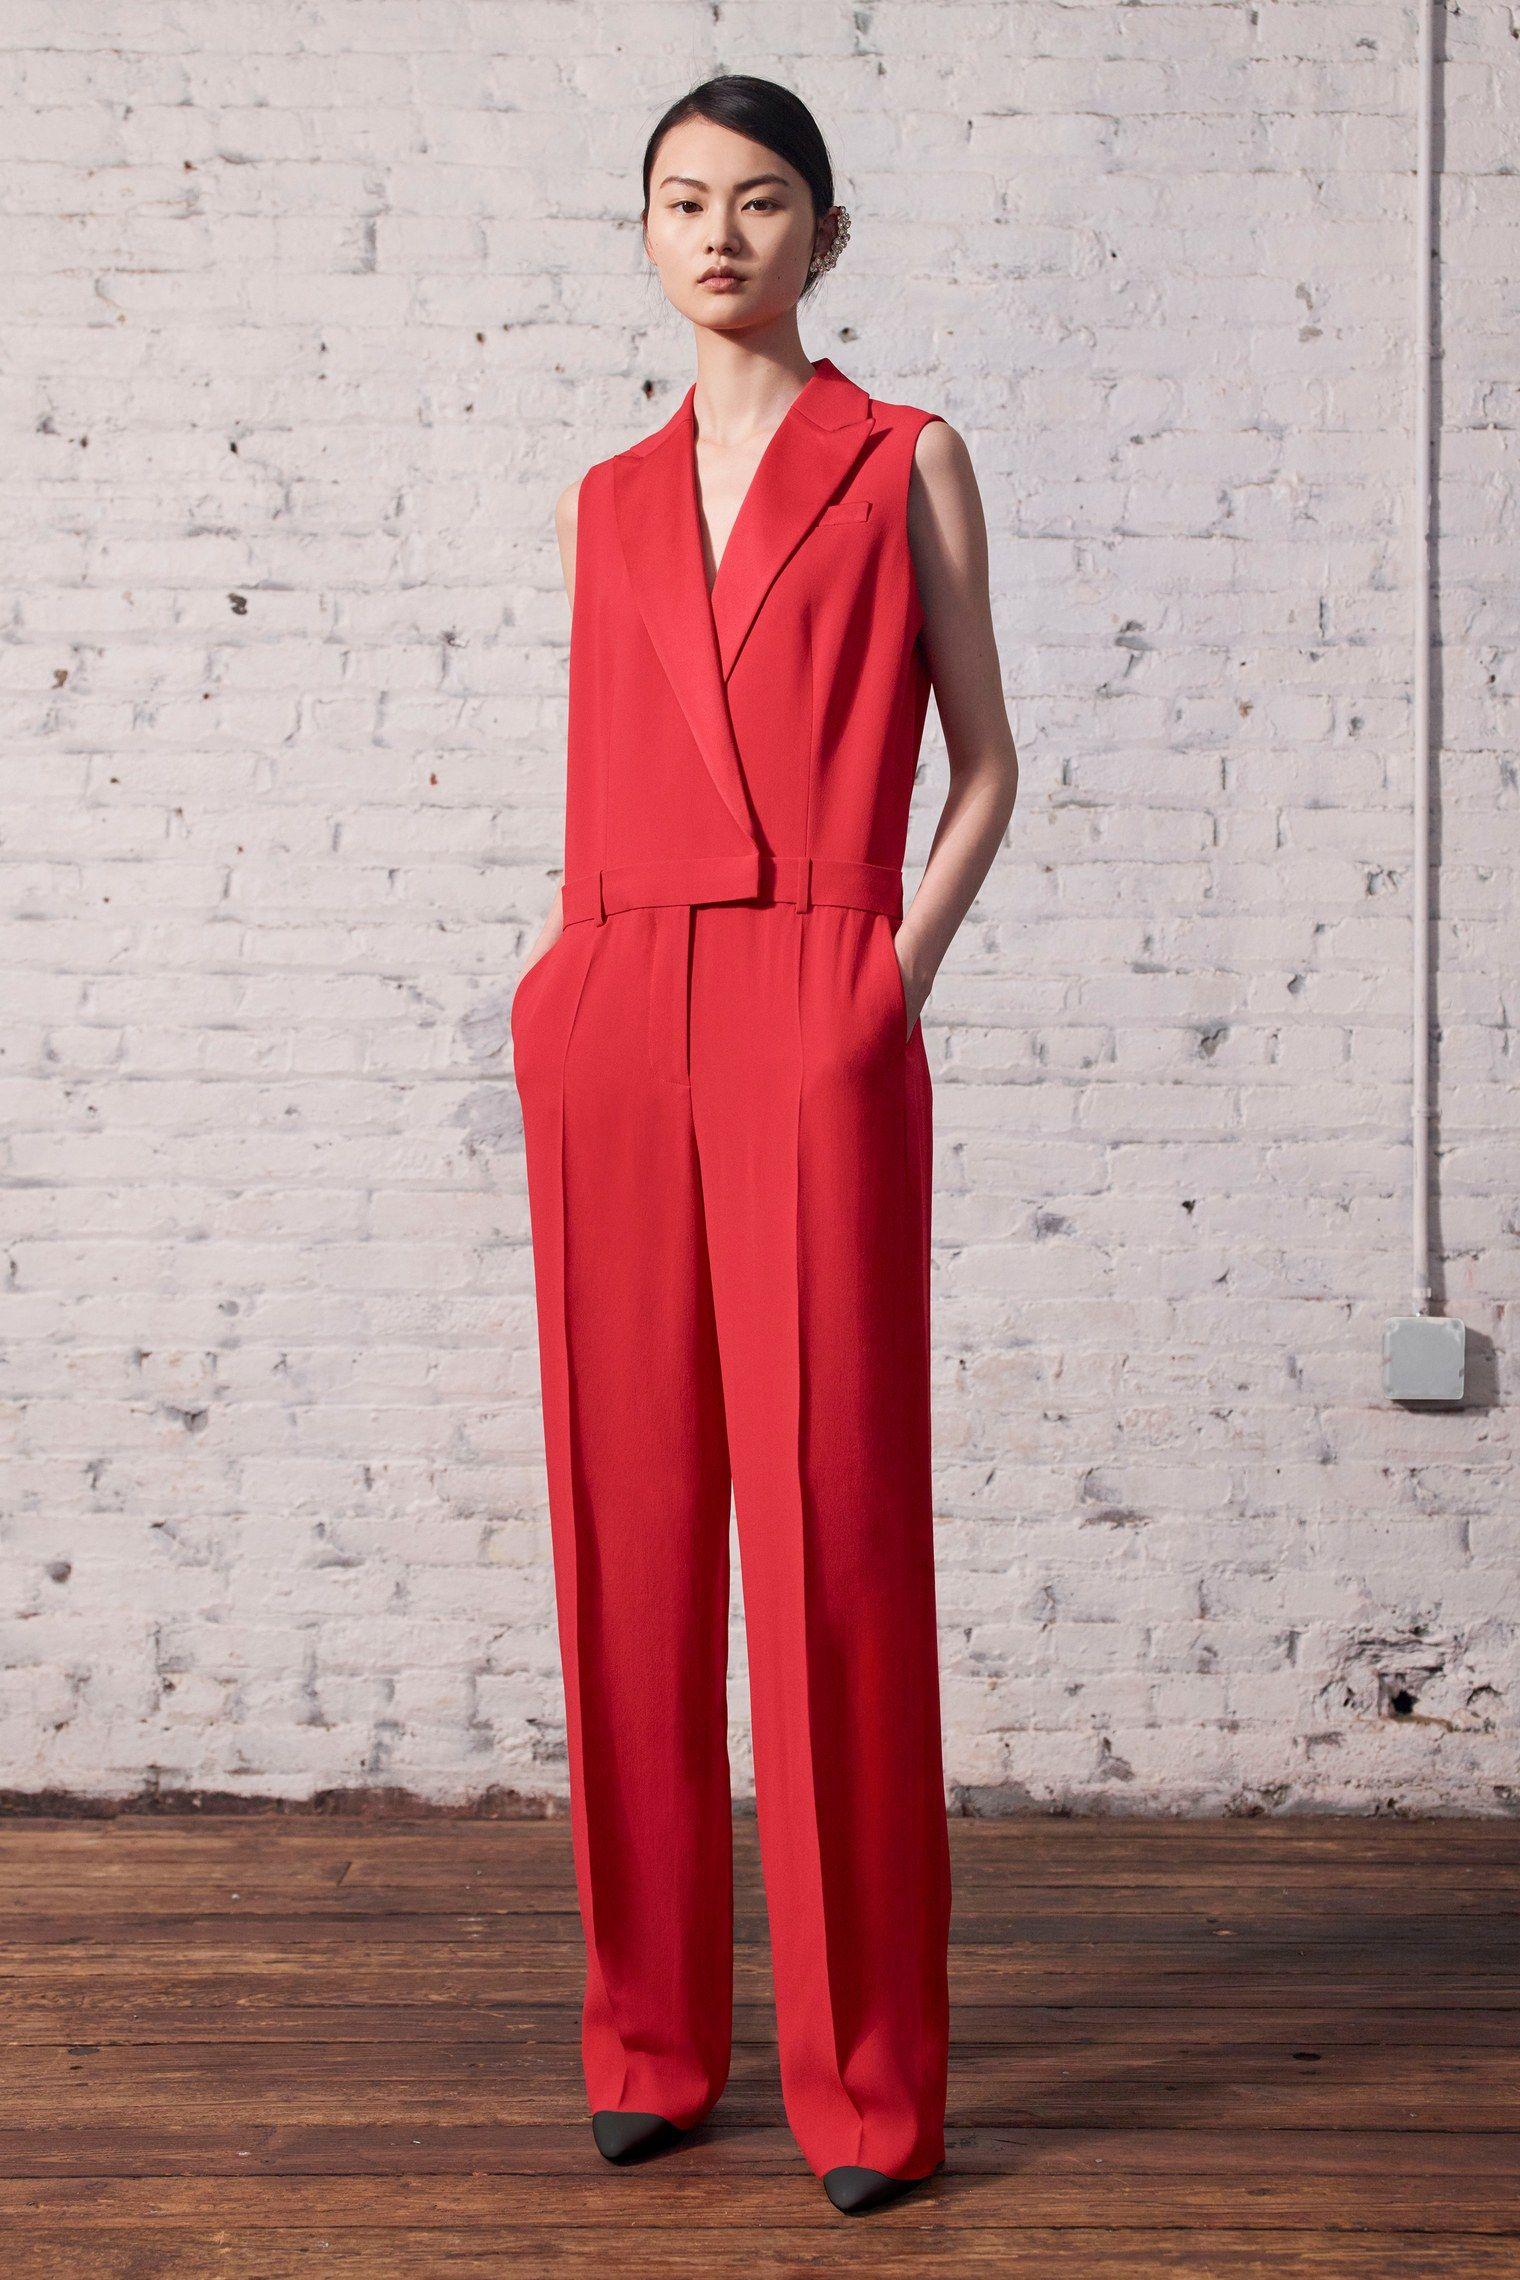 Jason Wu Resort 2020 Fashion Show Модные стили, Модный